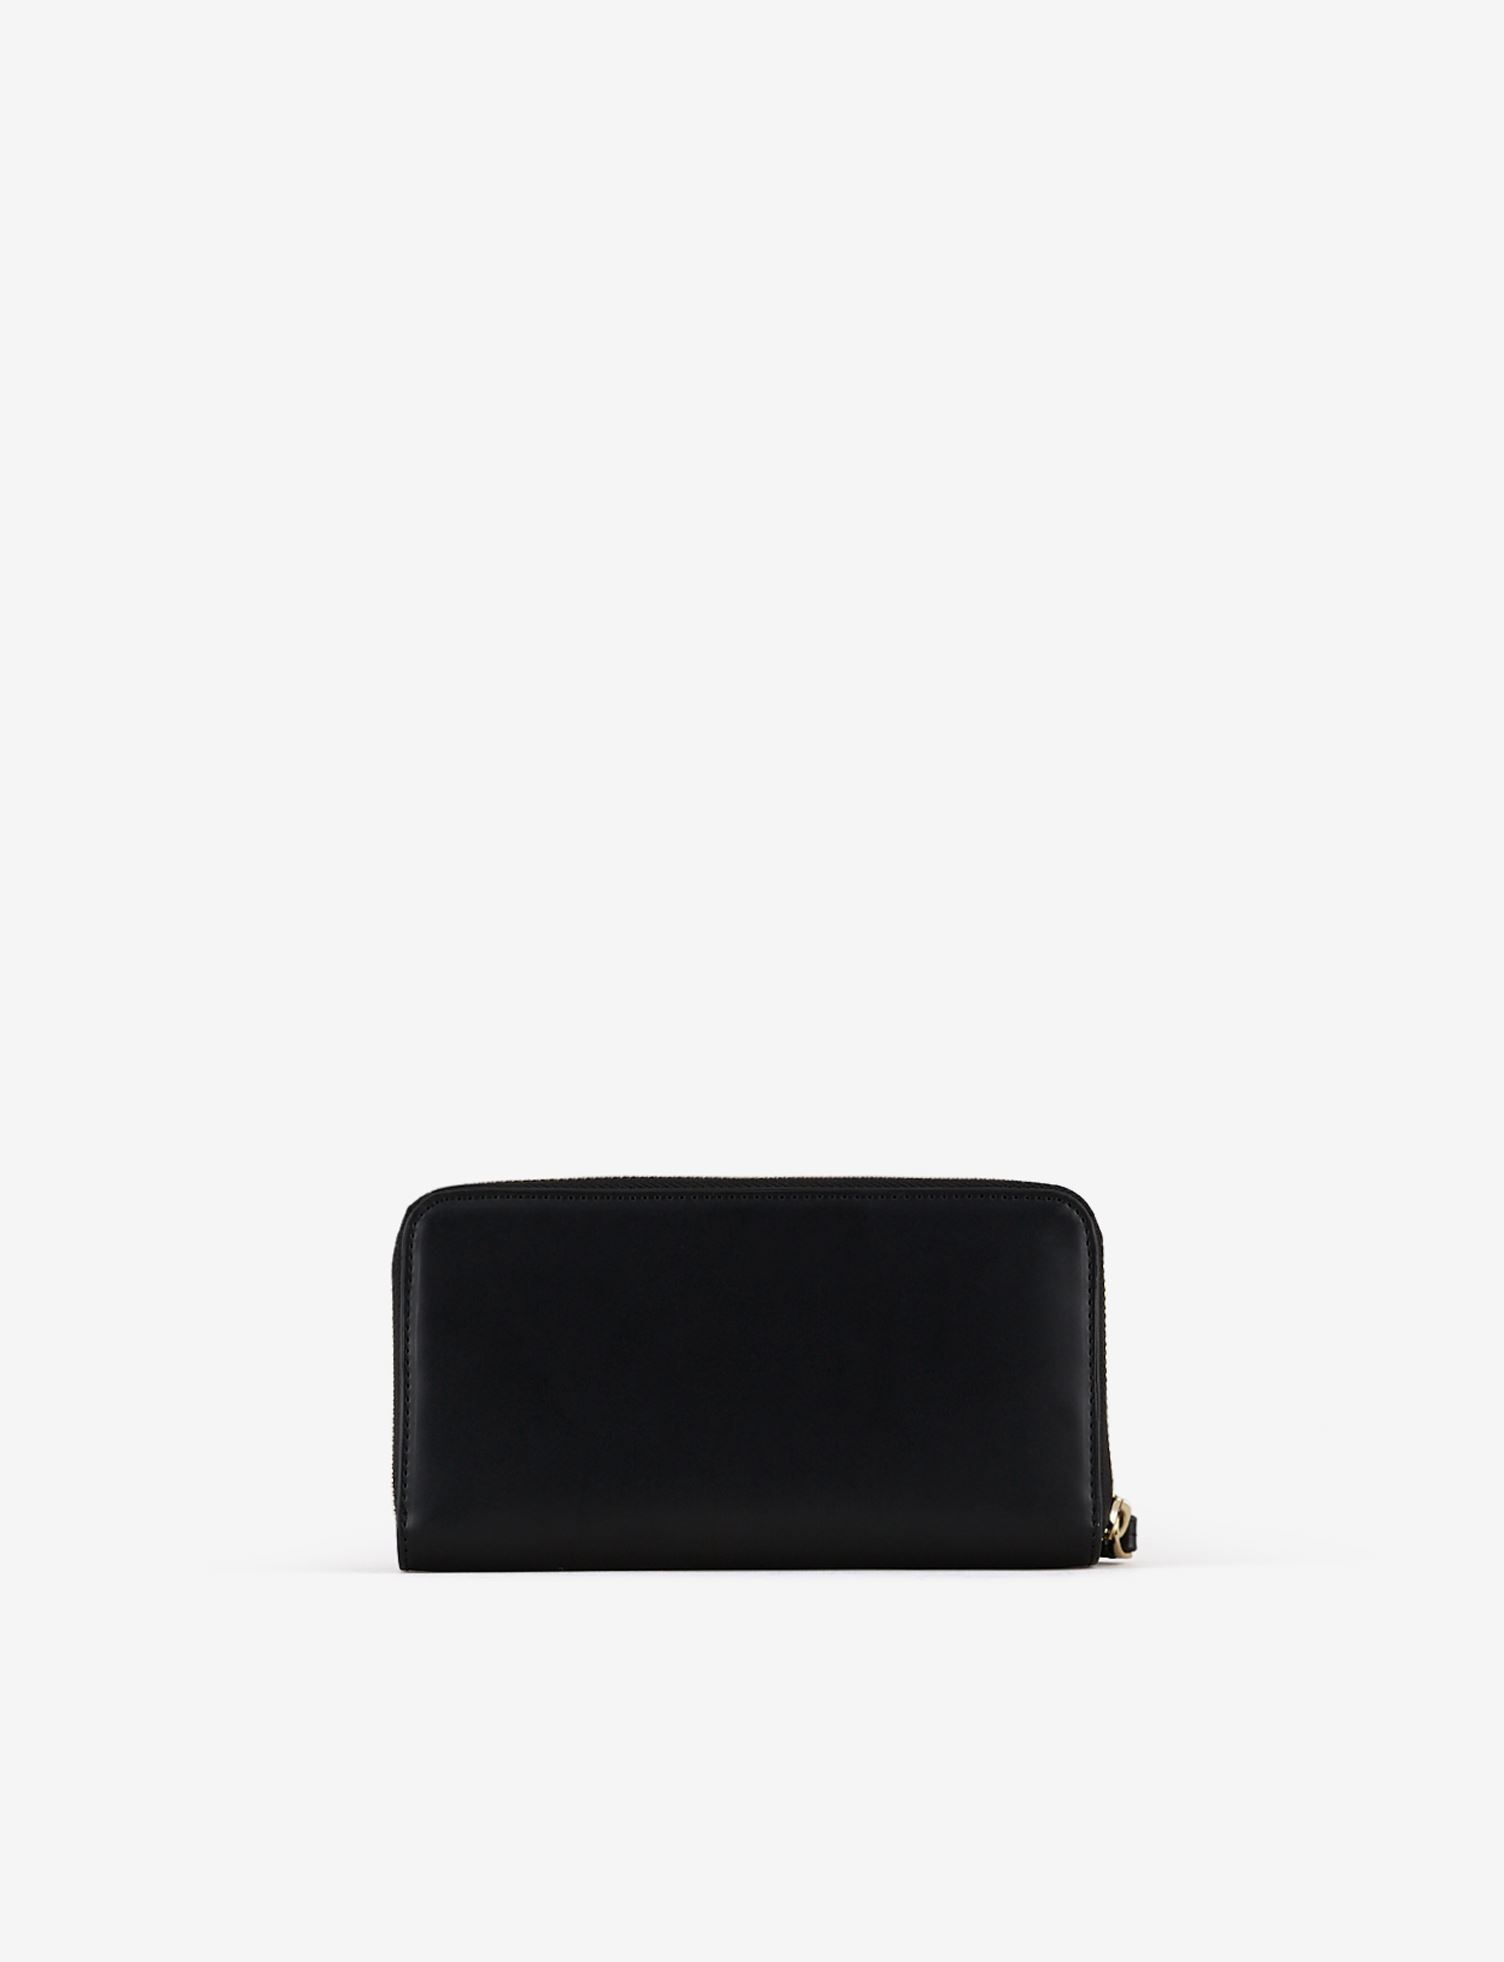 Portafoglio con zip Armani Exchange ARMANI EXCHANGE | Portacarte | 948068-CC79500020